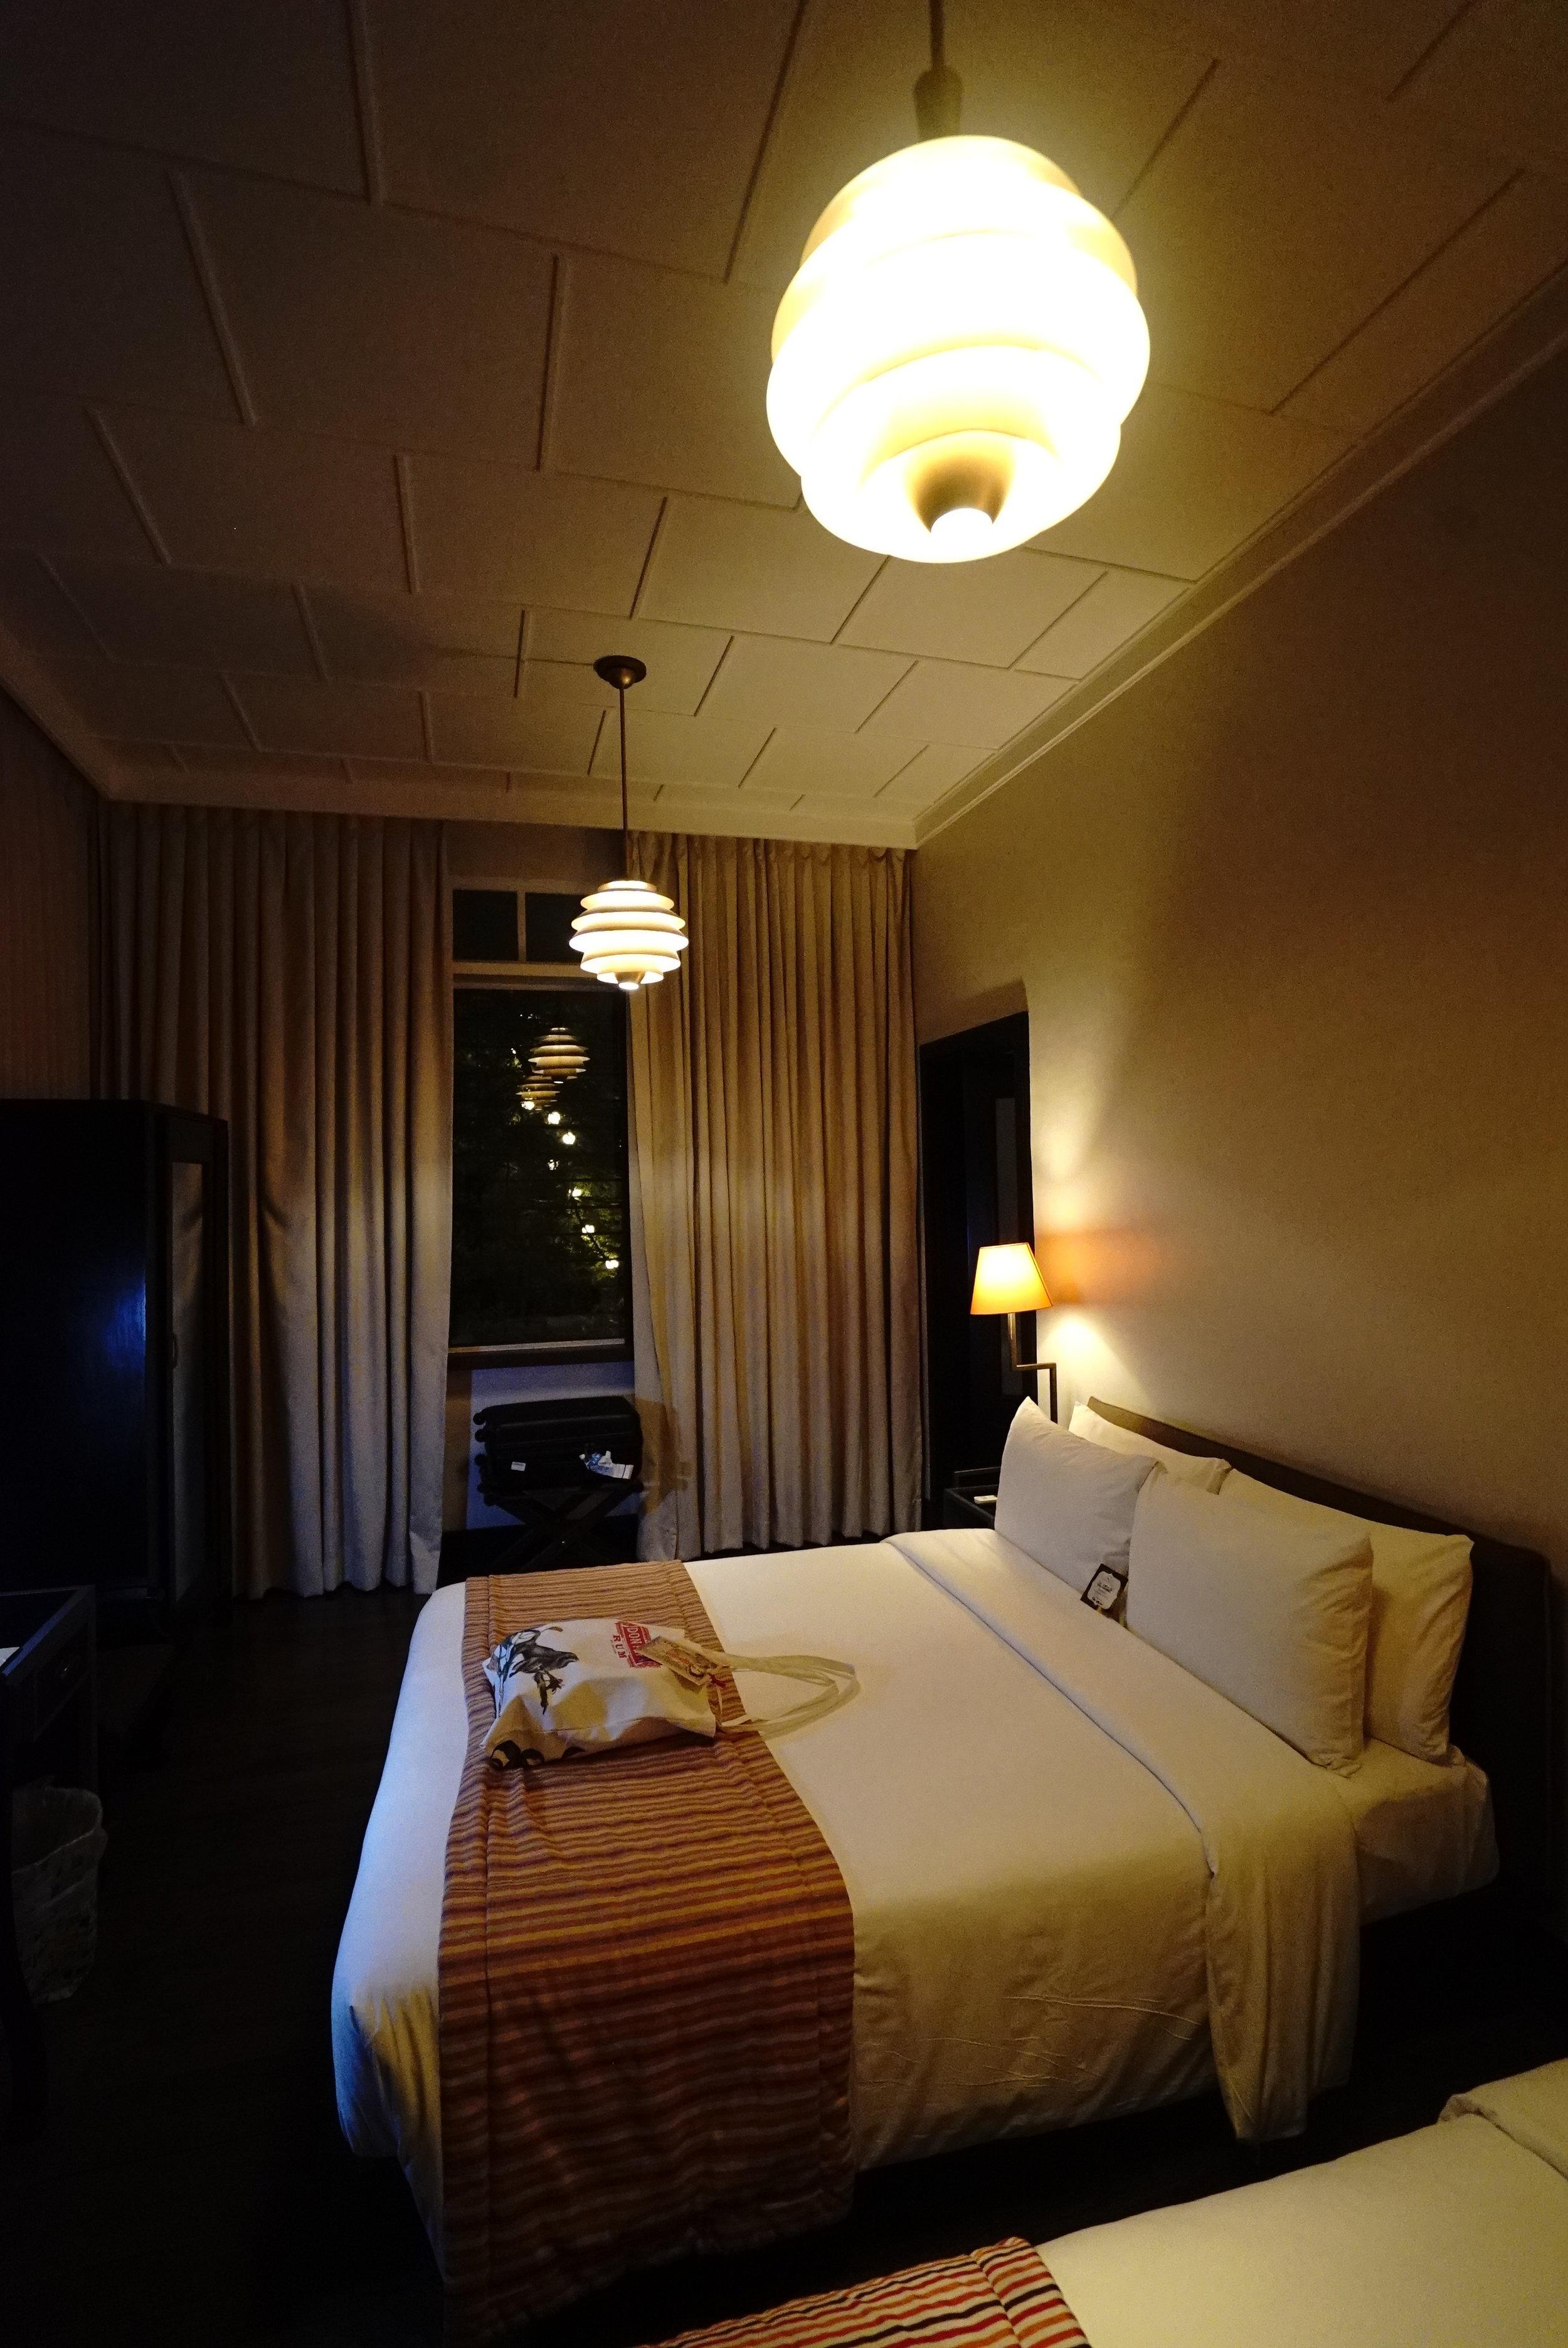 The Henry Hotel Bedroom.JPG